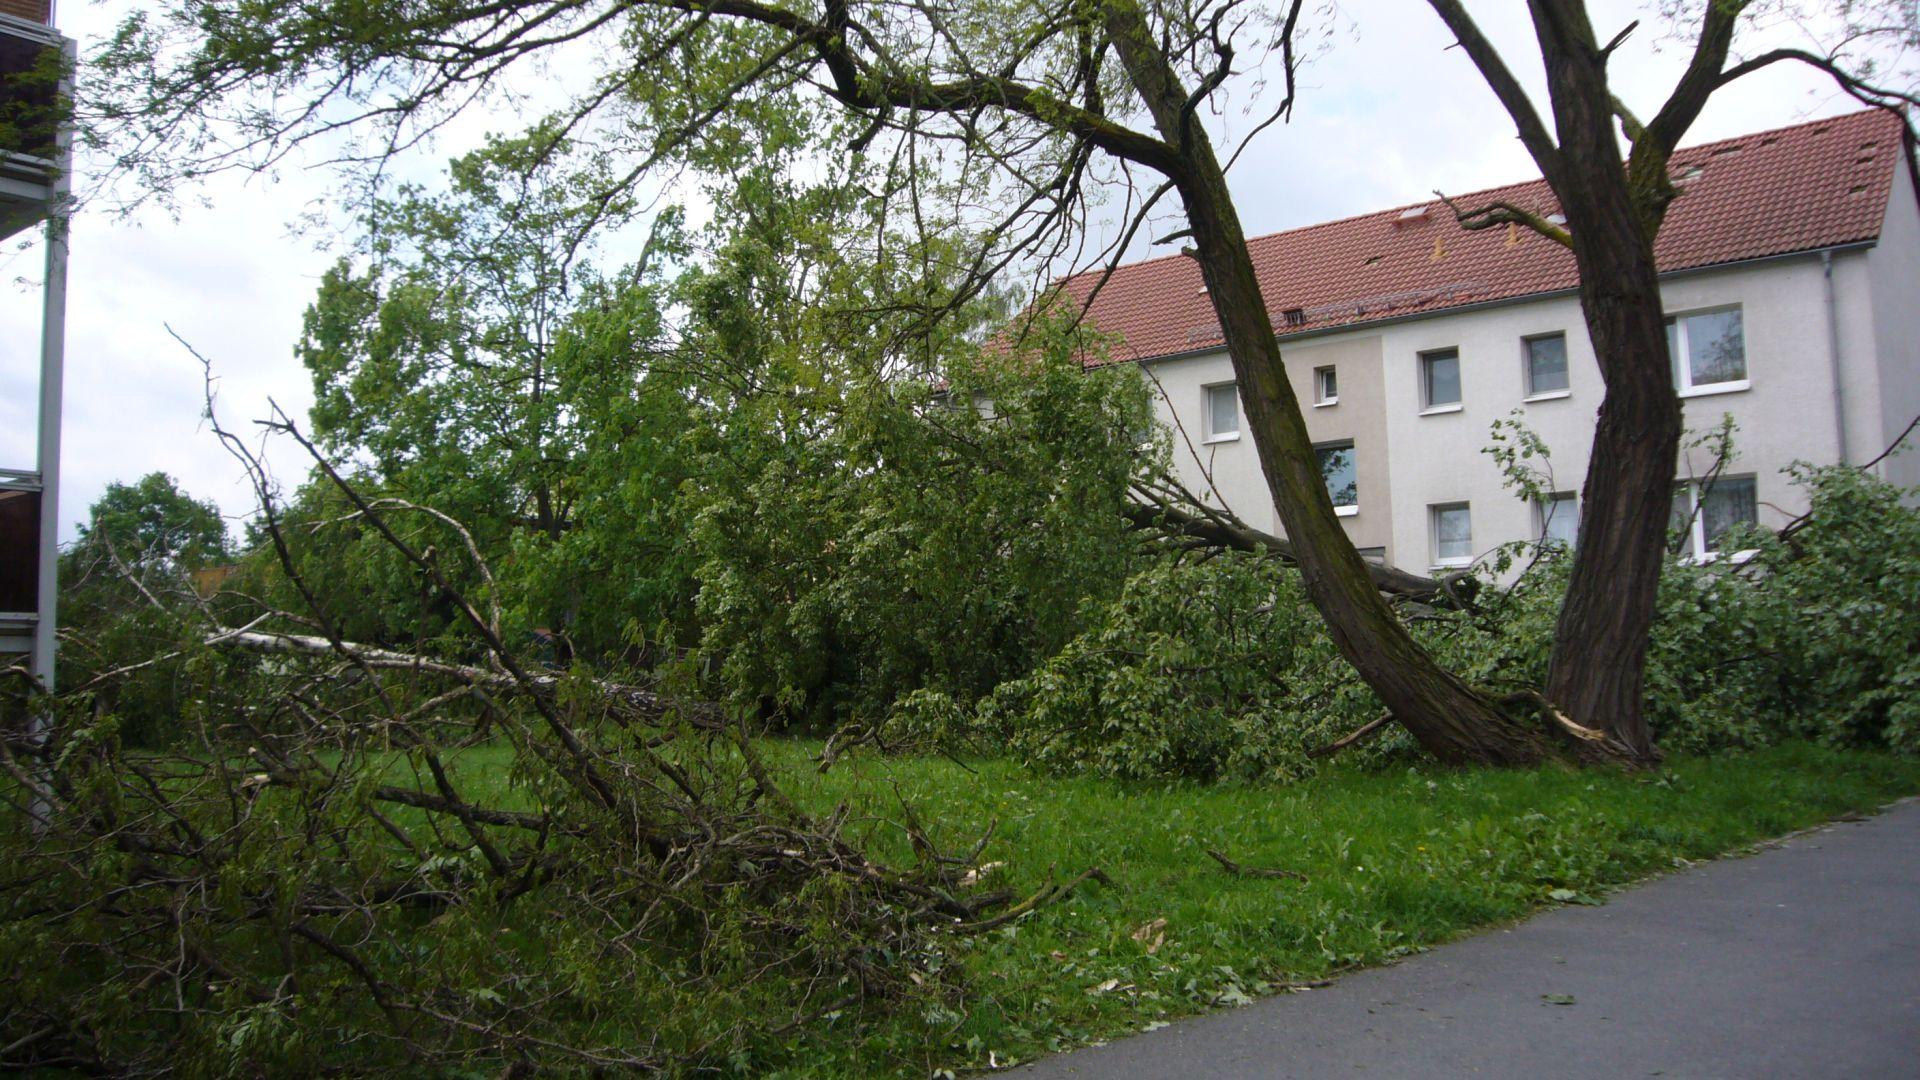 http://www.abload.de/img/tornadogrossenhain004uabr.jpg